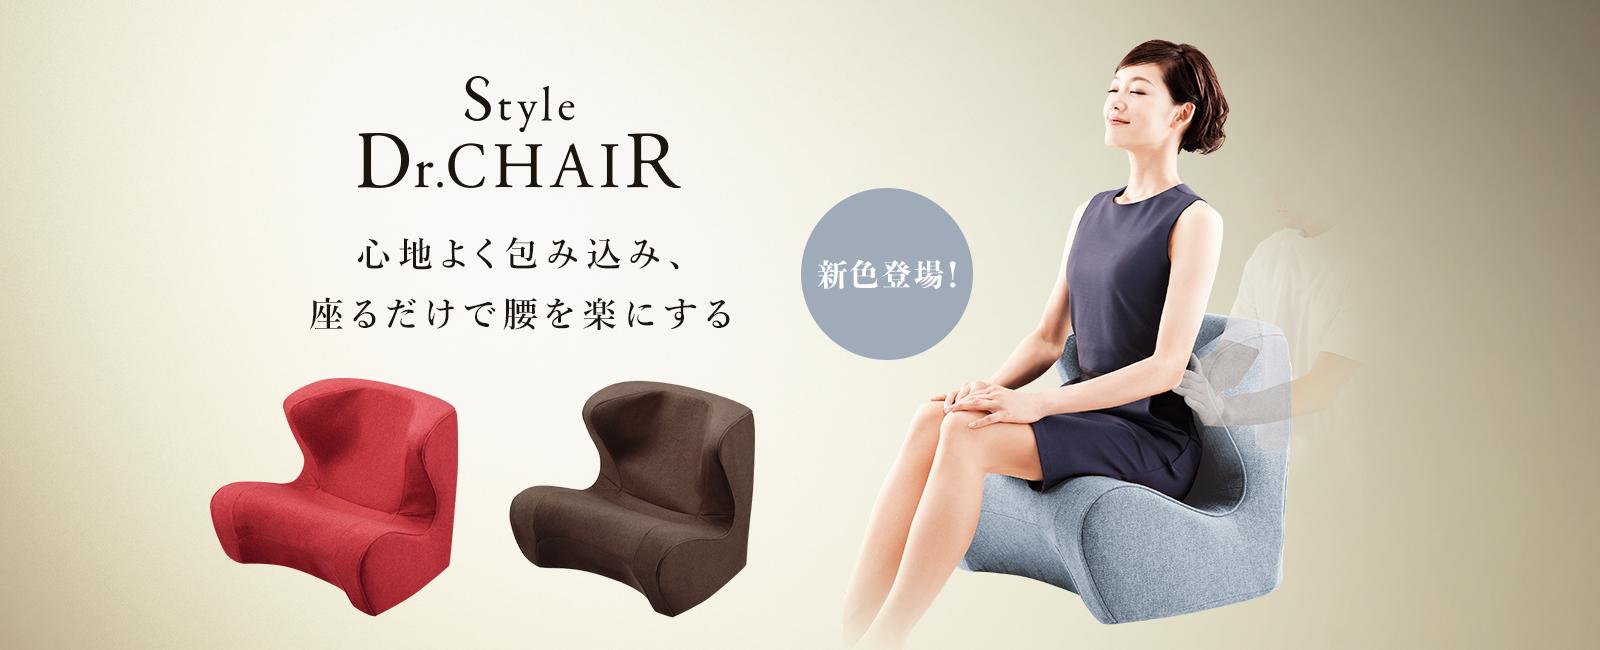 Style Dr.CHAIR新色ライトグレー登場!